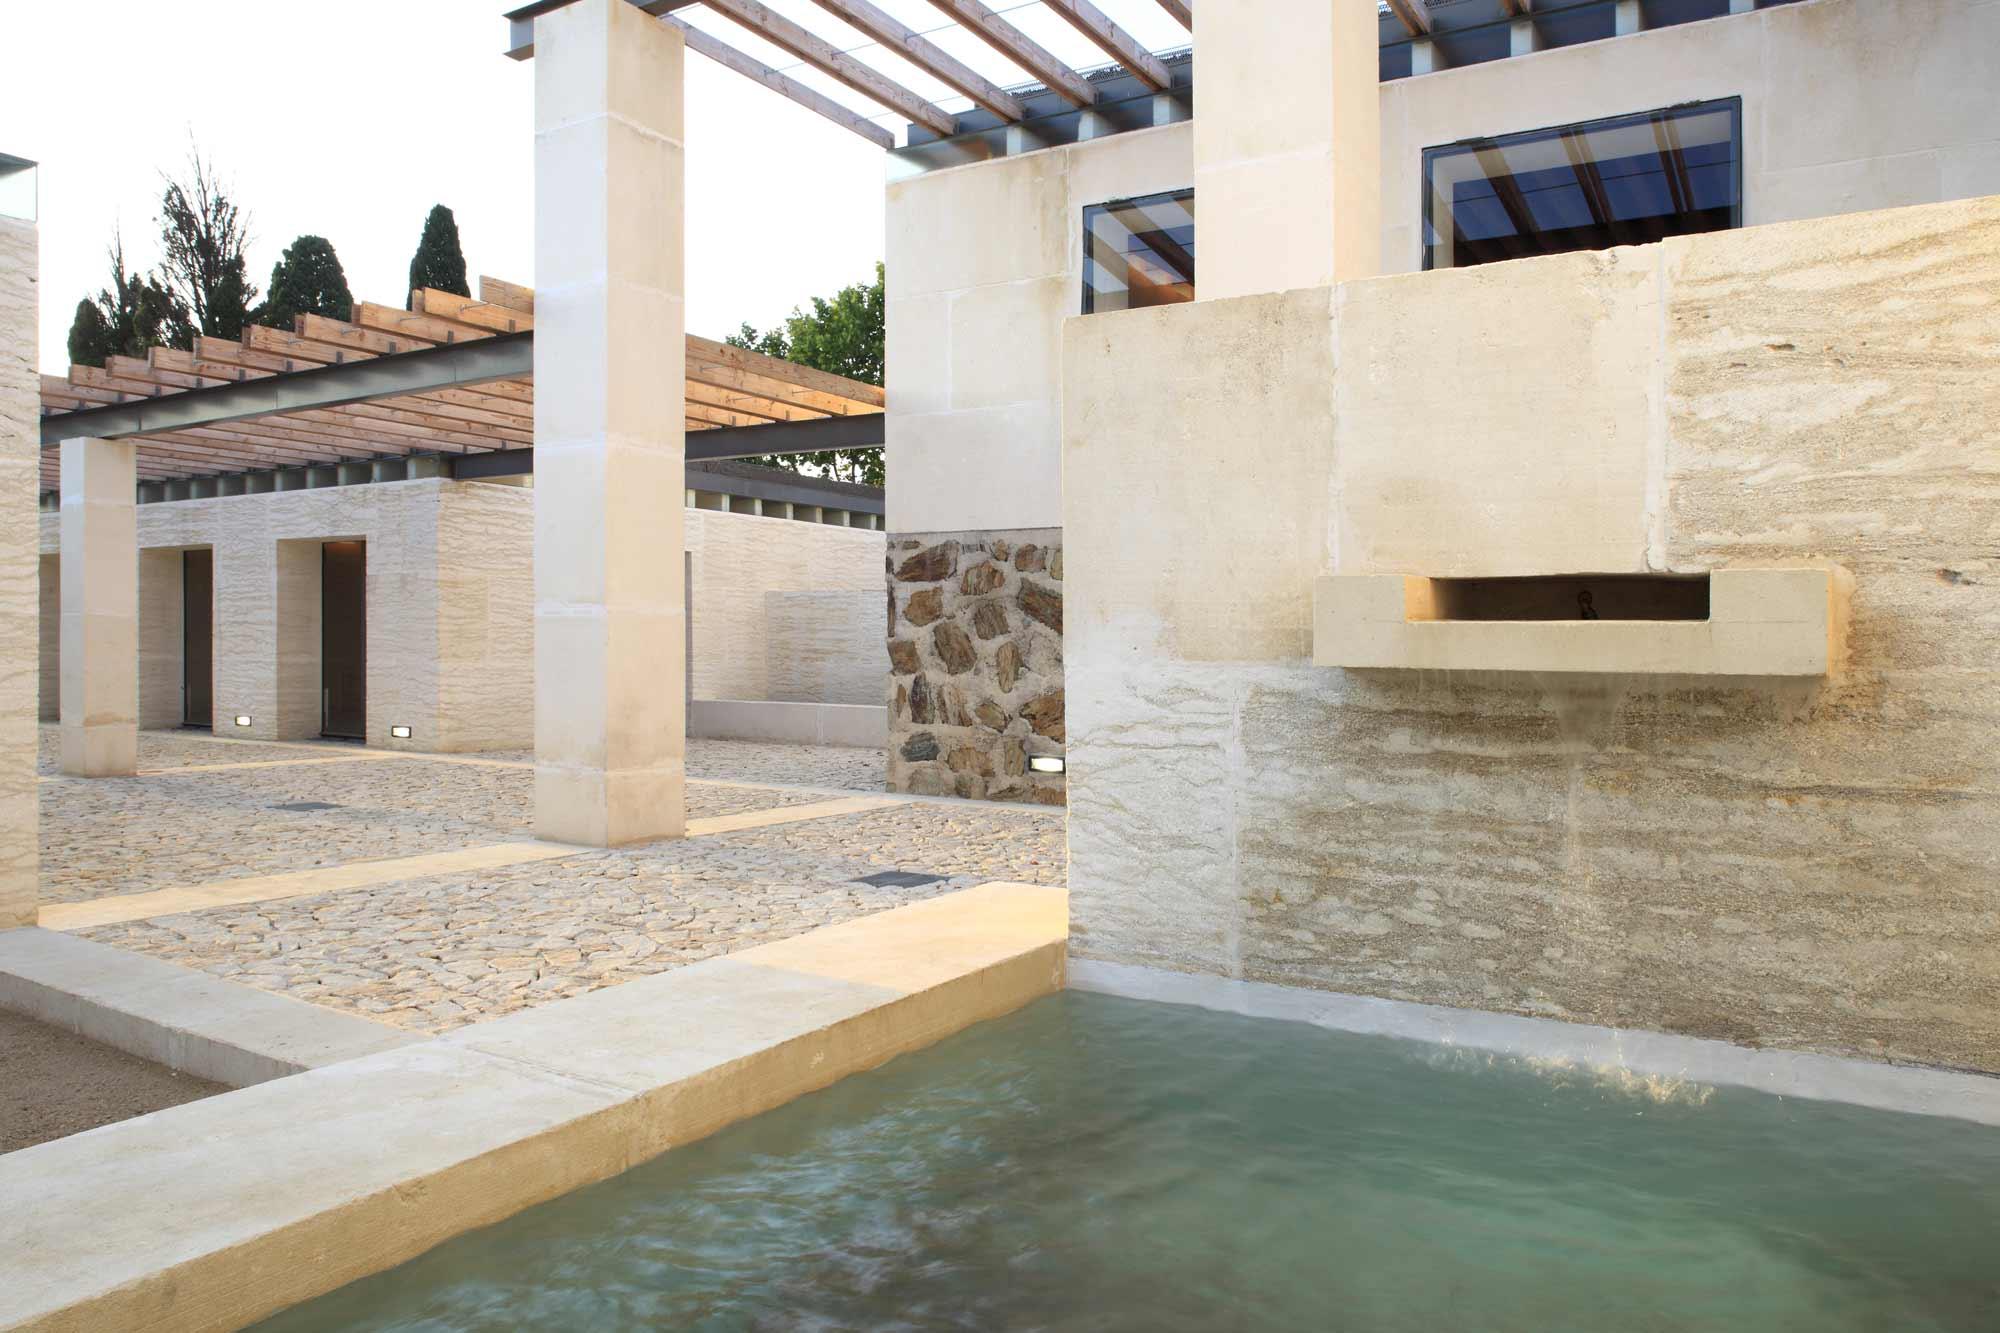 Maison des vins jardin amp lographique le off dd for Jardin des vins 2016 sion